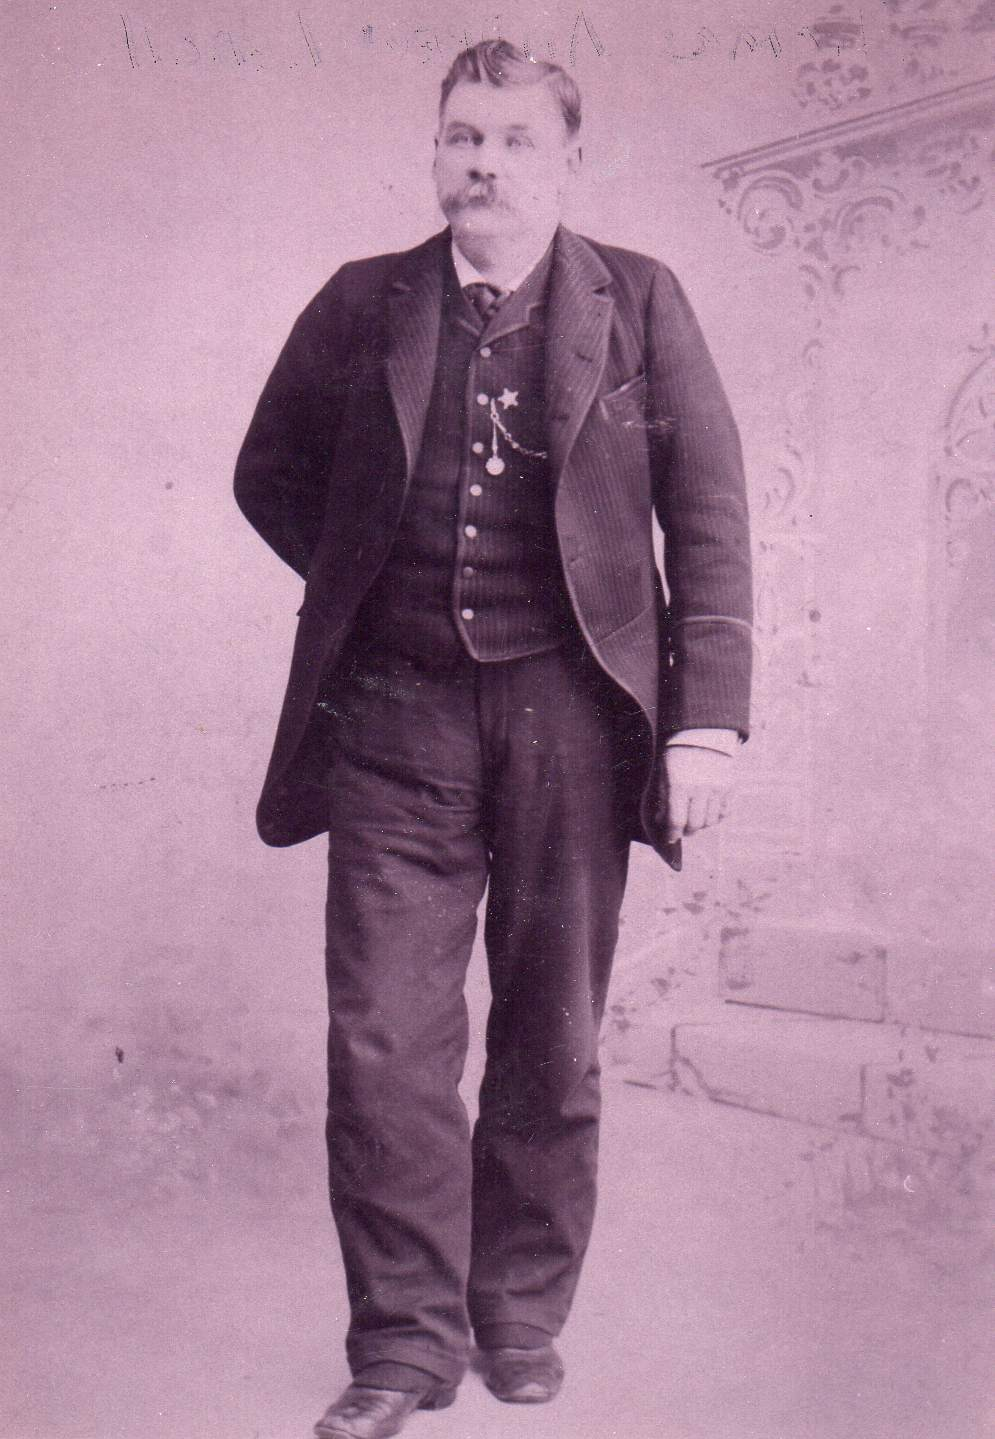 Thomas Andrew Leach